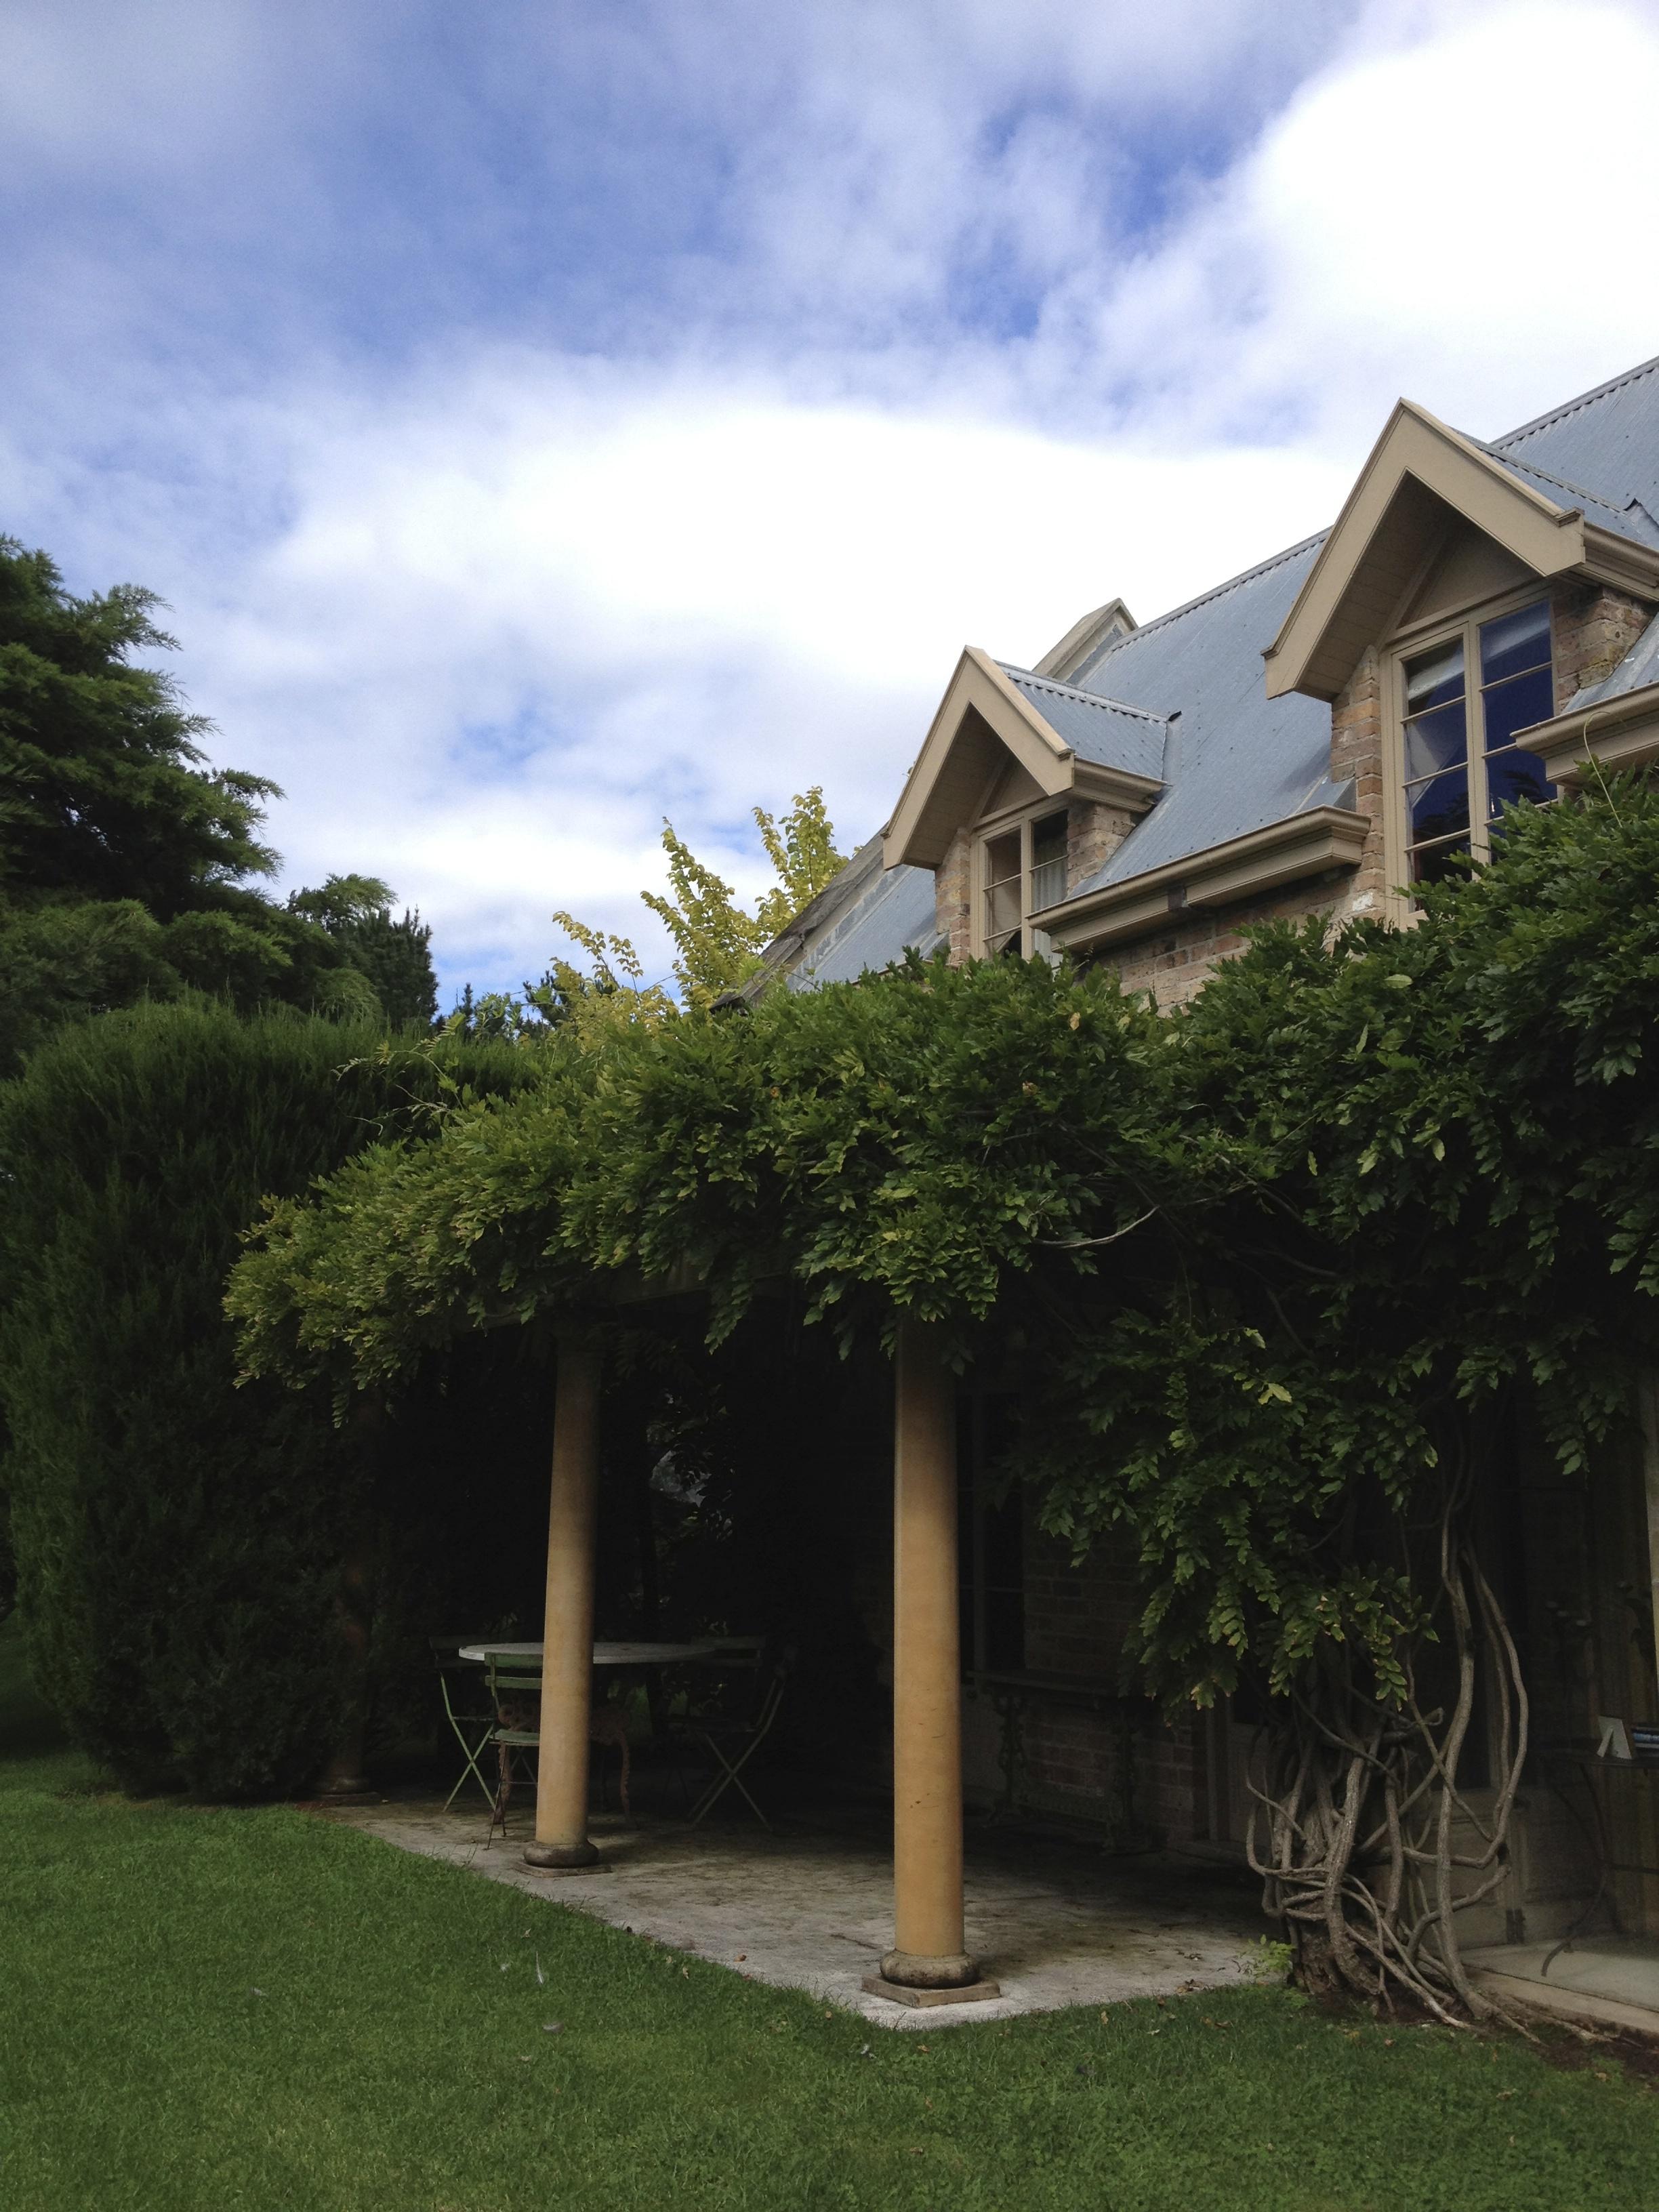 Andrew_Economos_Custom_Builder_Bowral_NSW_Australia_French_Provincial_Home_1.jpg